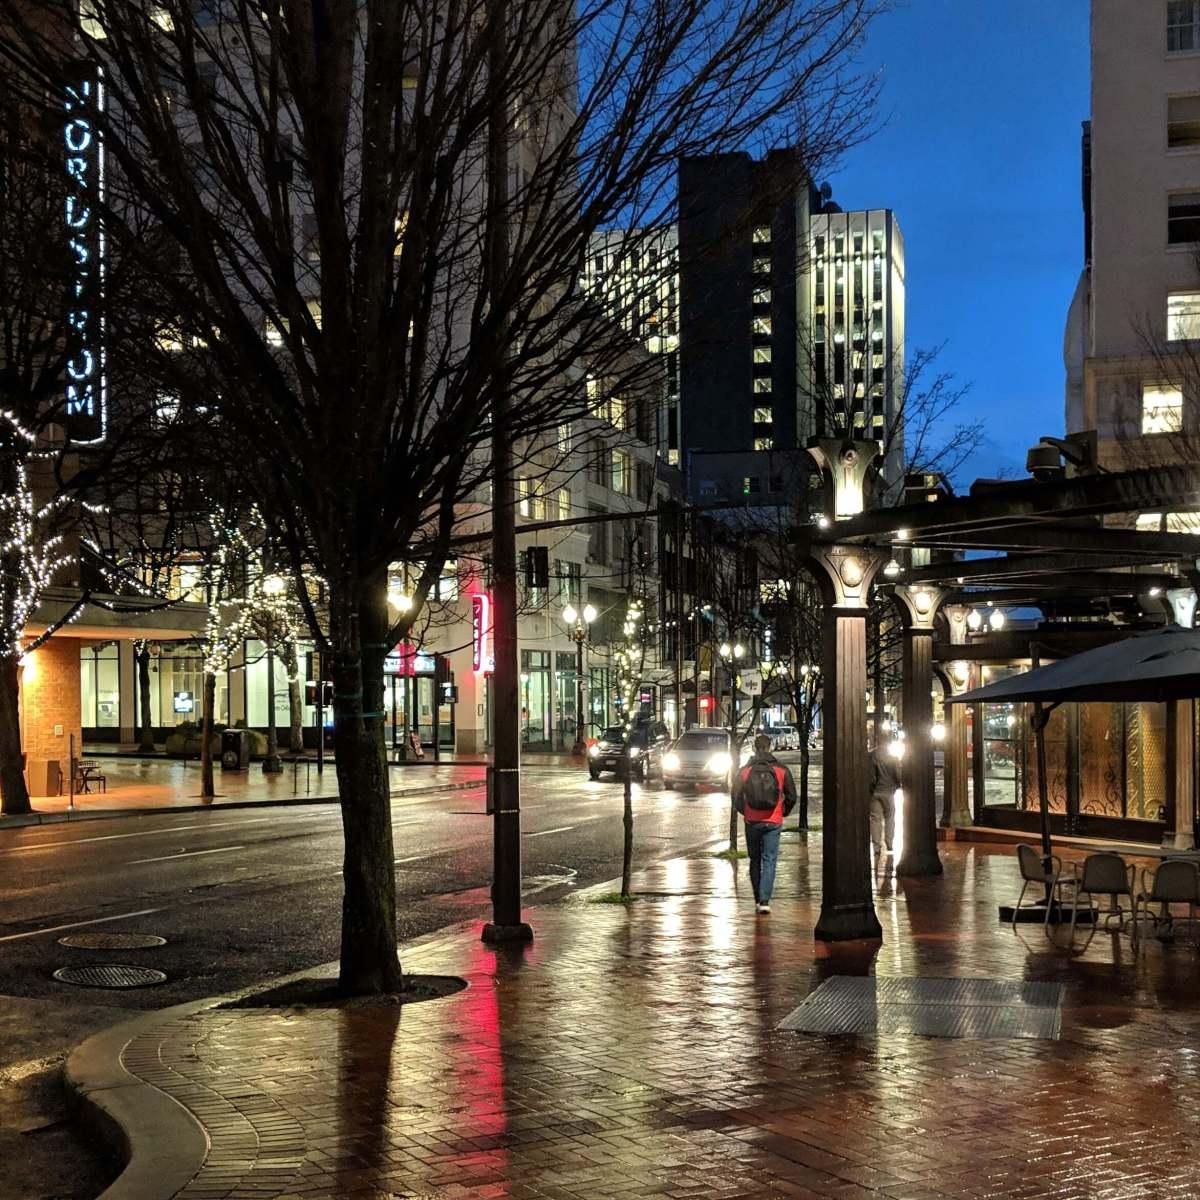 Good morning, Portland!